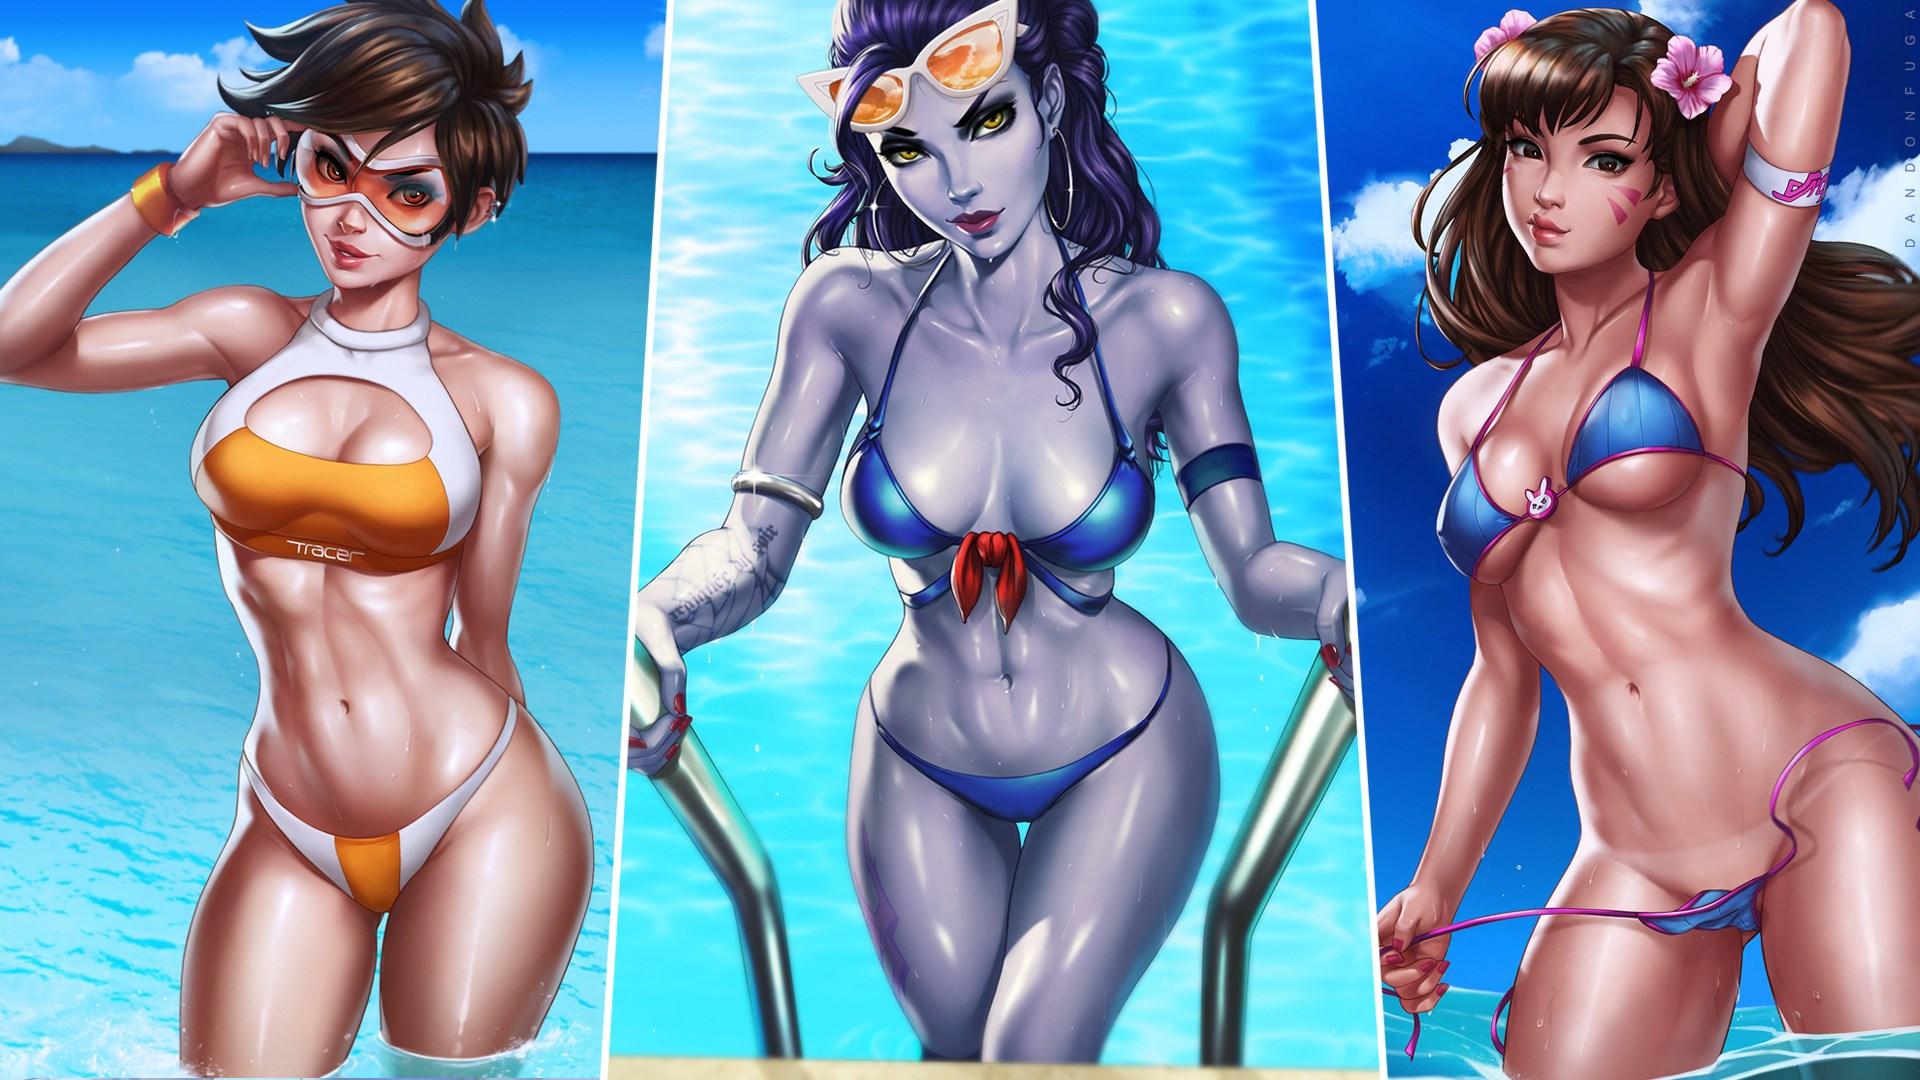 Tracer bikini overwatch Cara Theobold